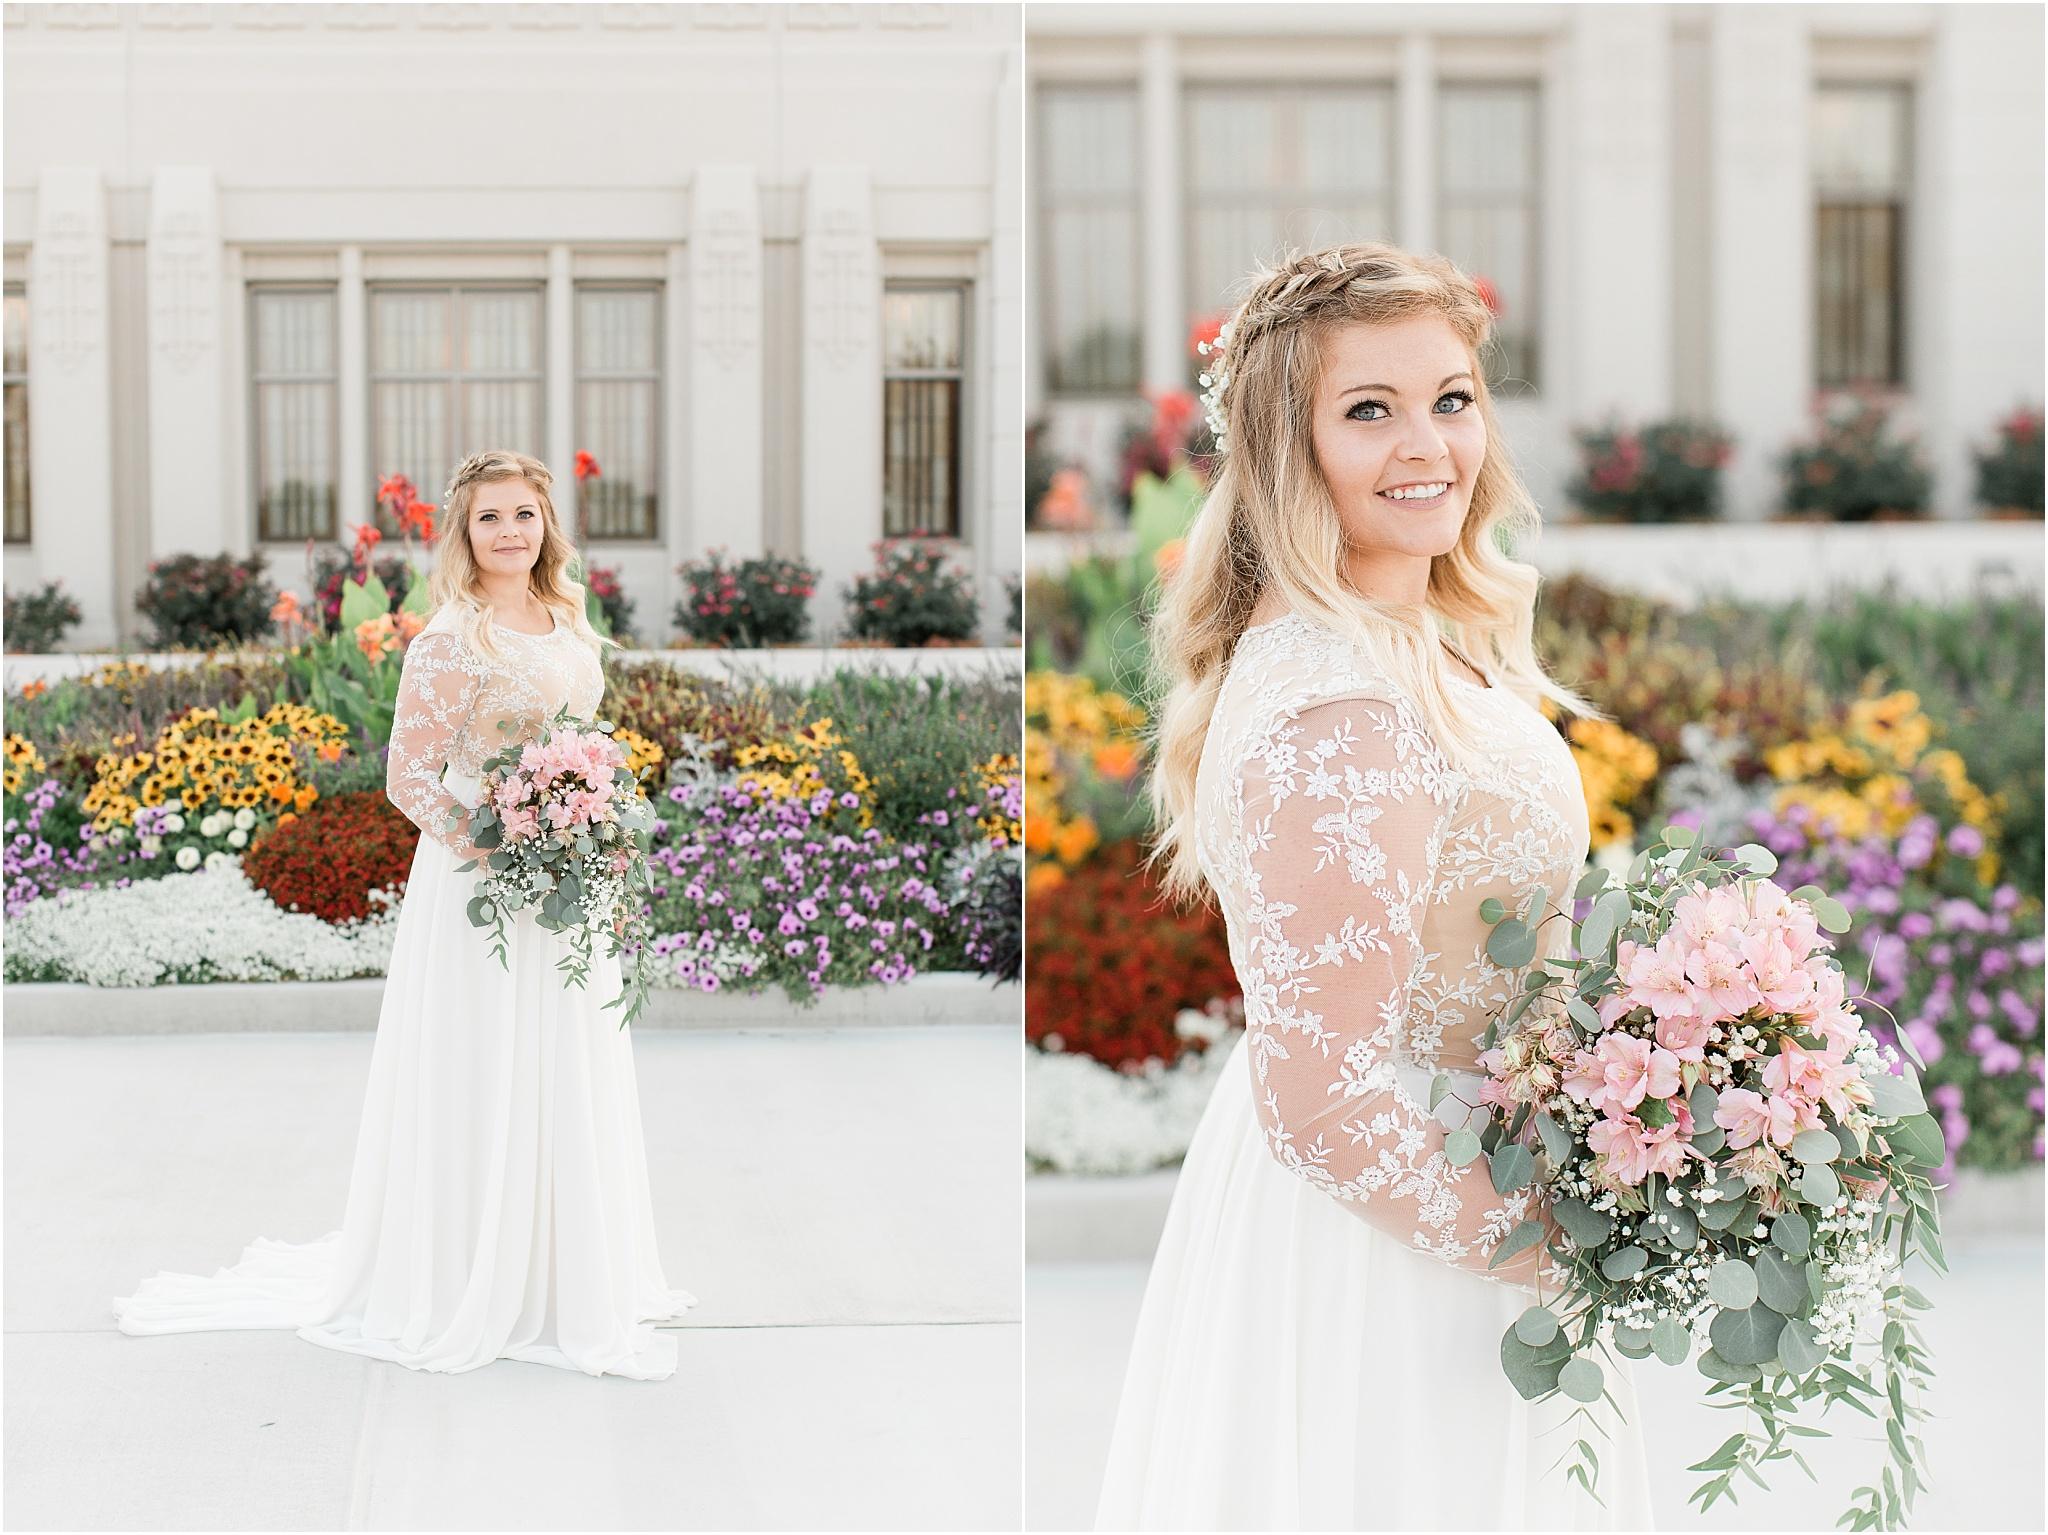 Wedding Photography_Meridian Idaho Temple_Boise Idaho_Nampa Idaho_Leah Southwick Photography_0018.jpg